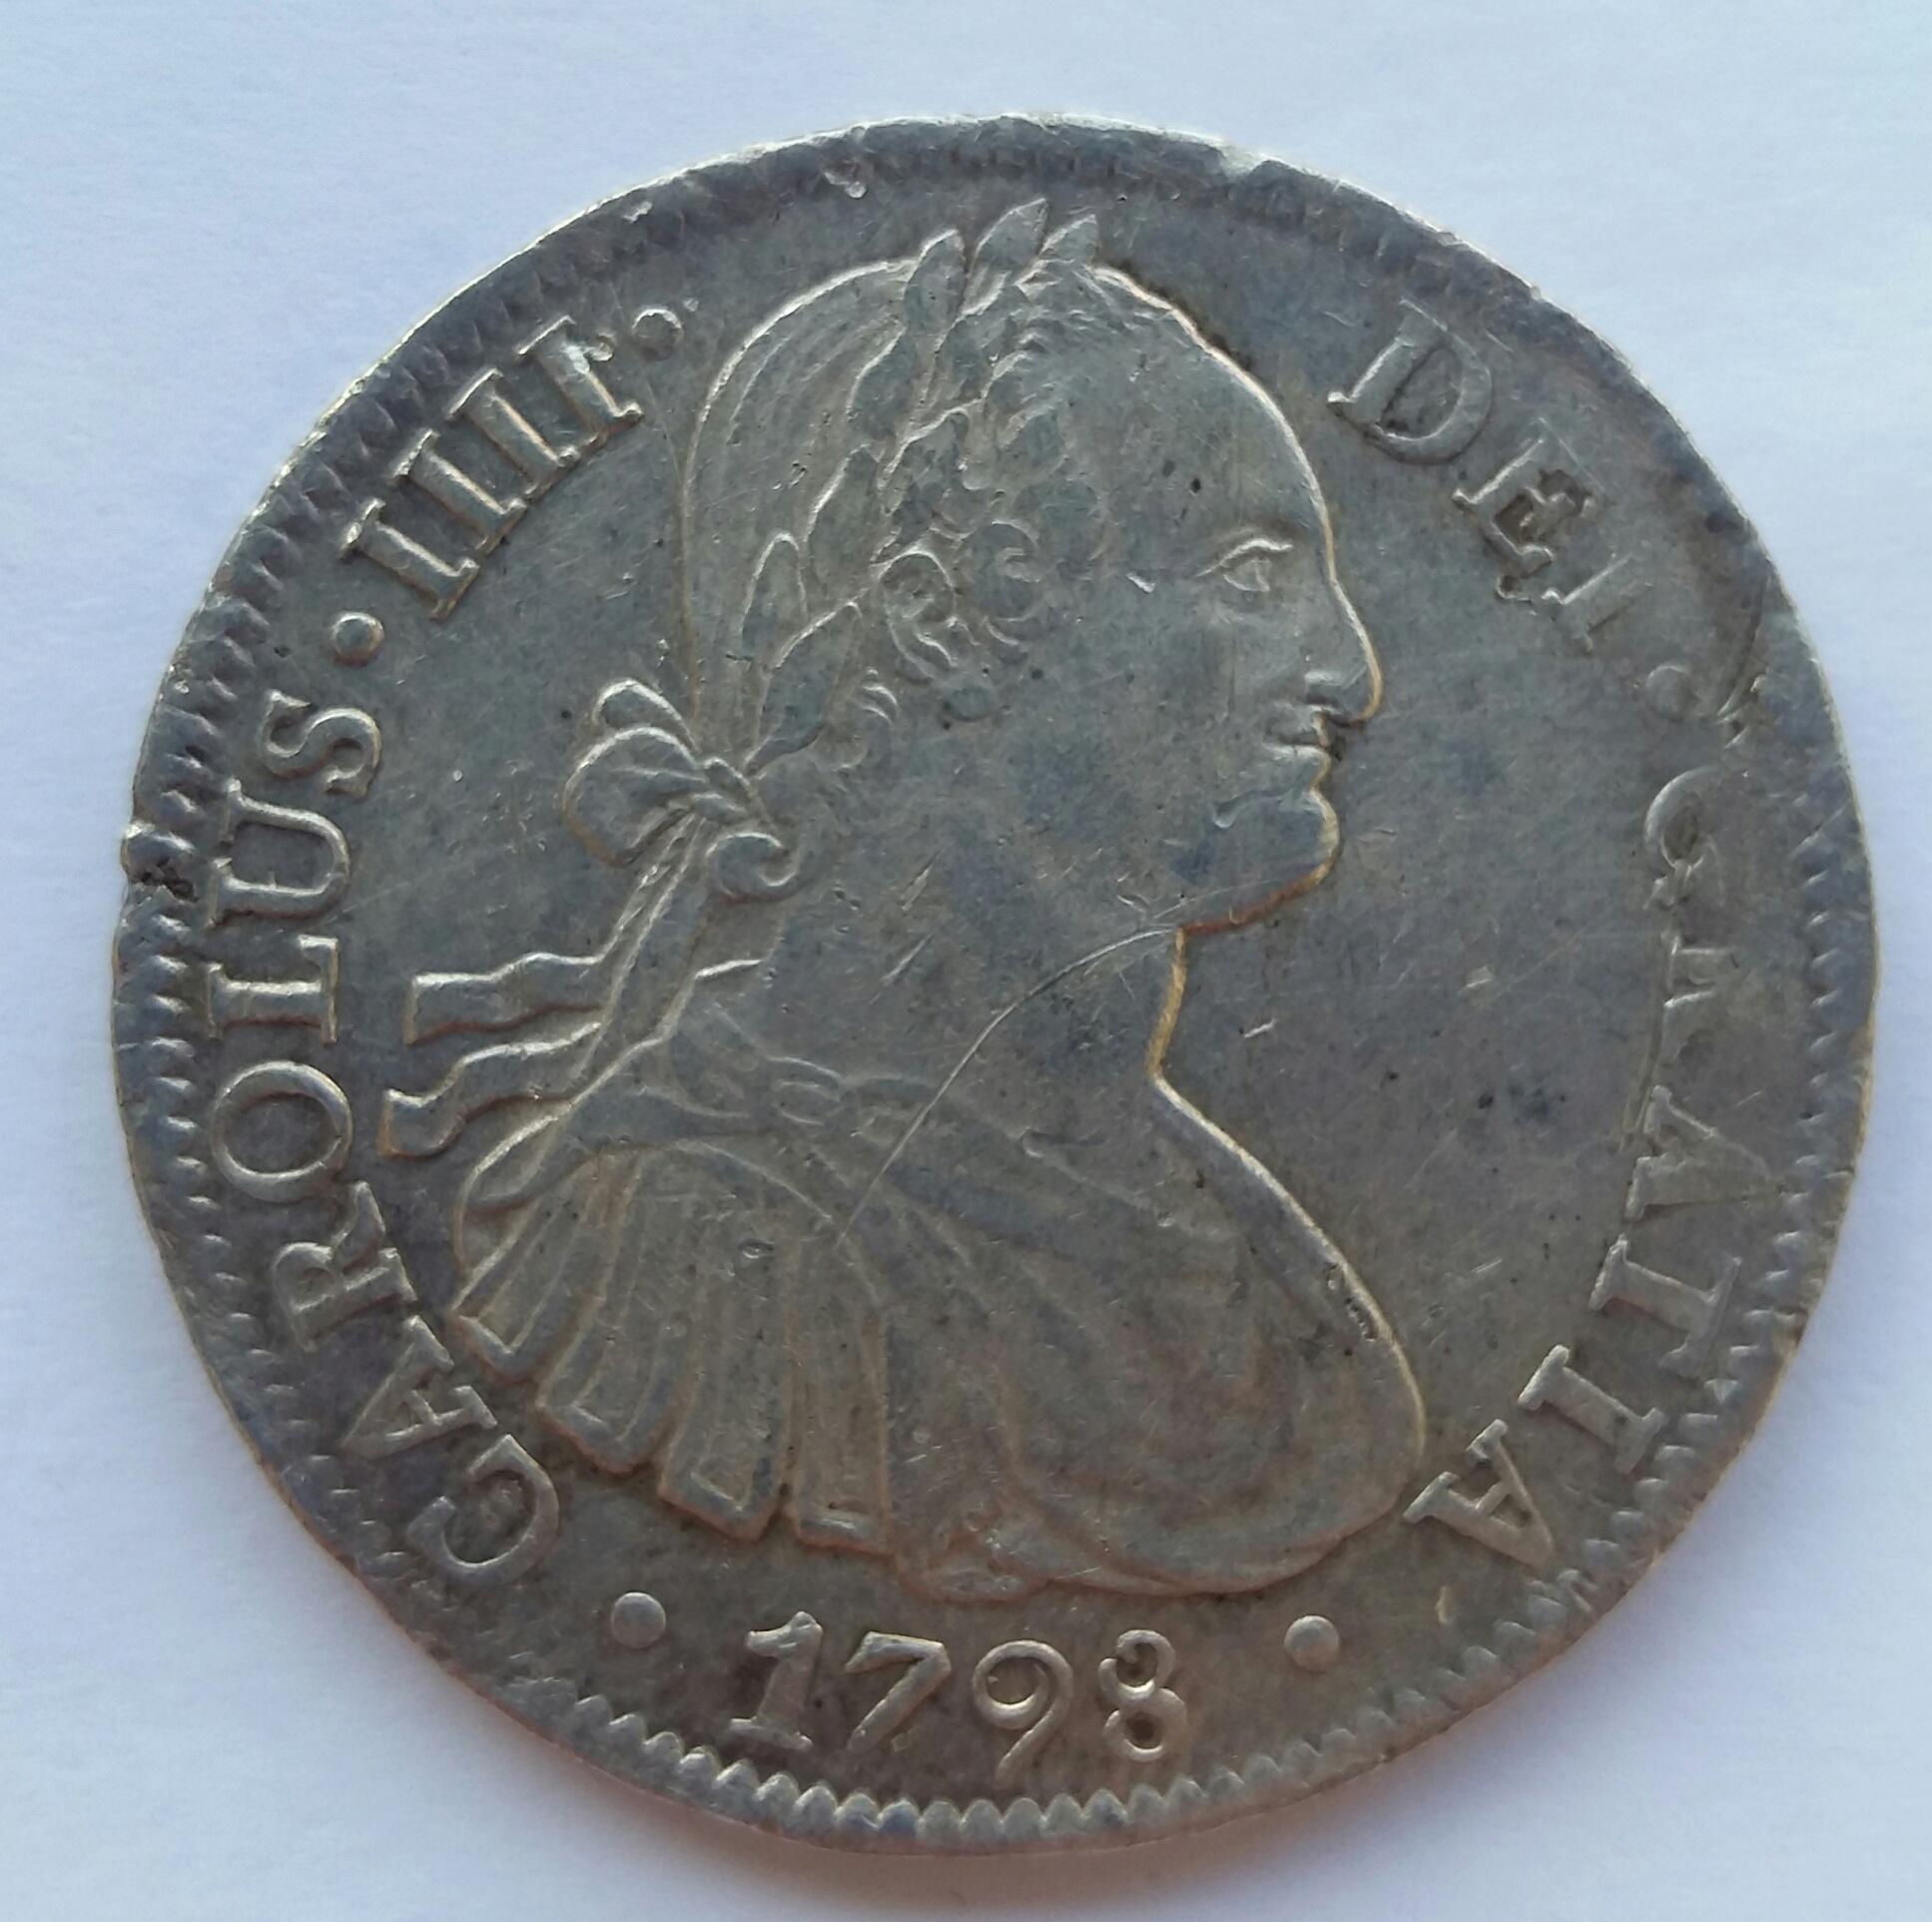 8 Reales 1798. Carlos IV. Mexico FM 20200115